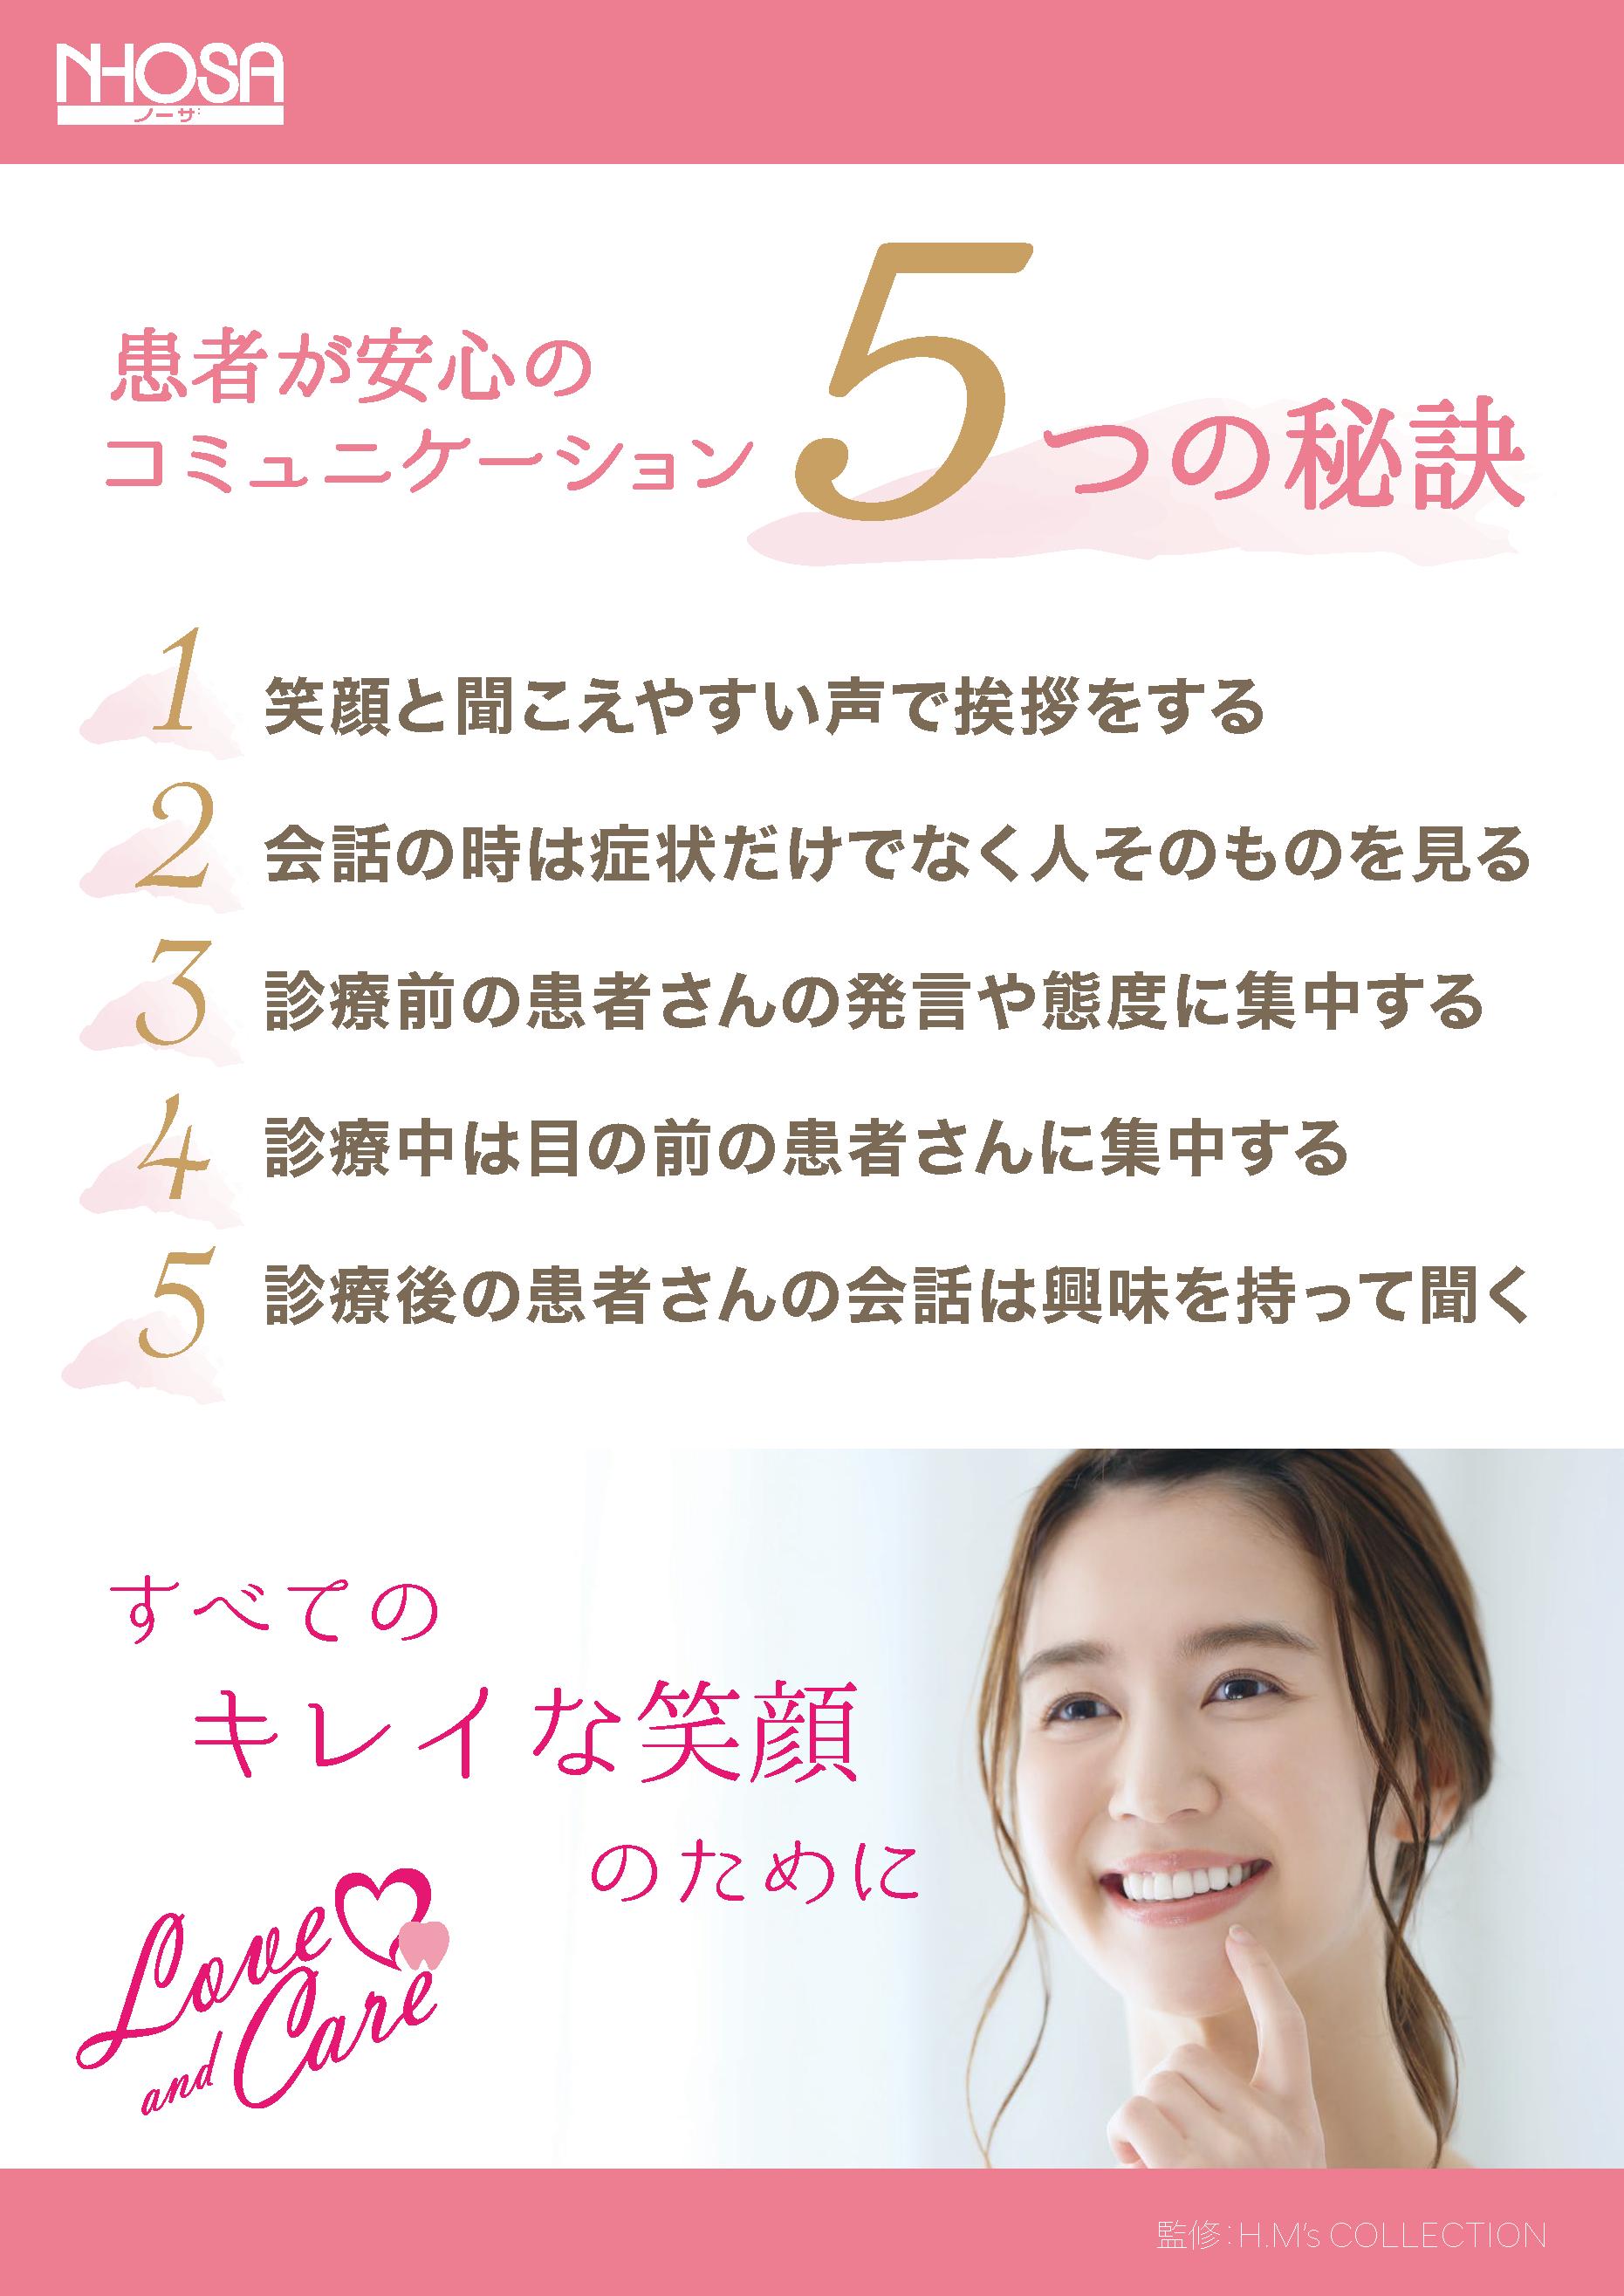 【DL資料】「歯科医療接遇(動画)」より 患者が安心のコミュニケーション5つの秘訣